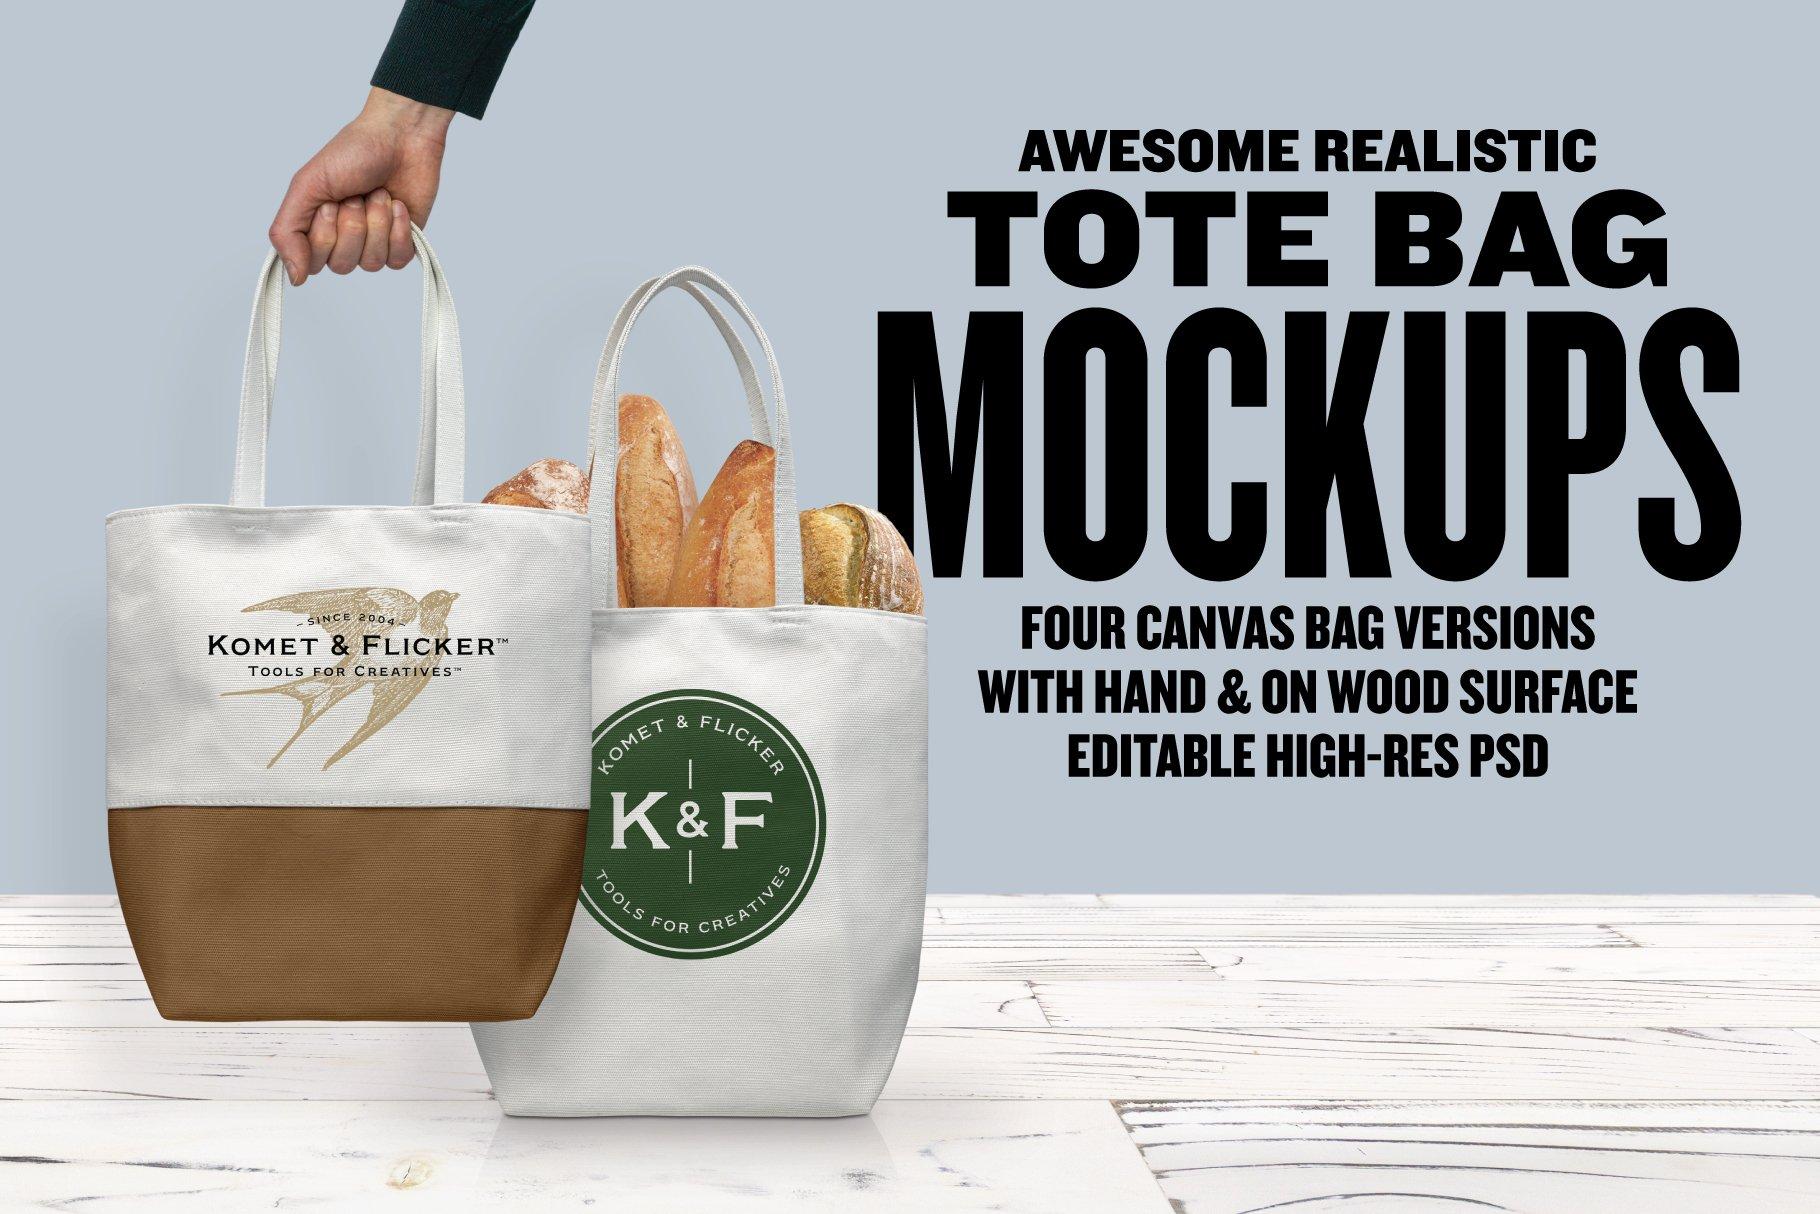 逼真白色帆布手提袋样机素材 Realistic Canvas Tote Bag Mockups插图